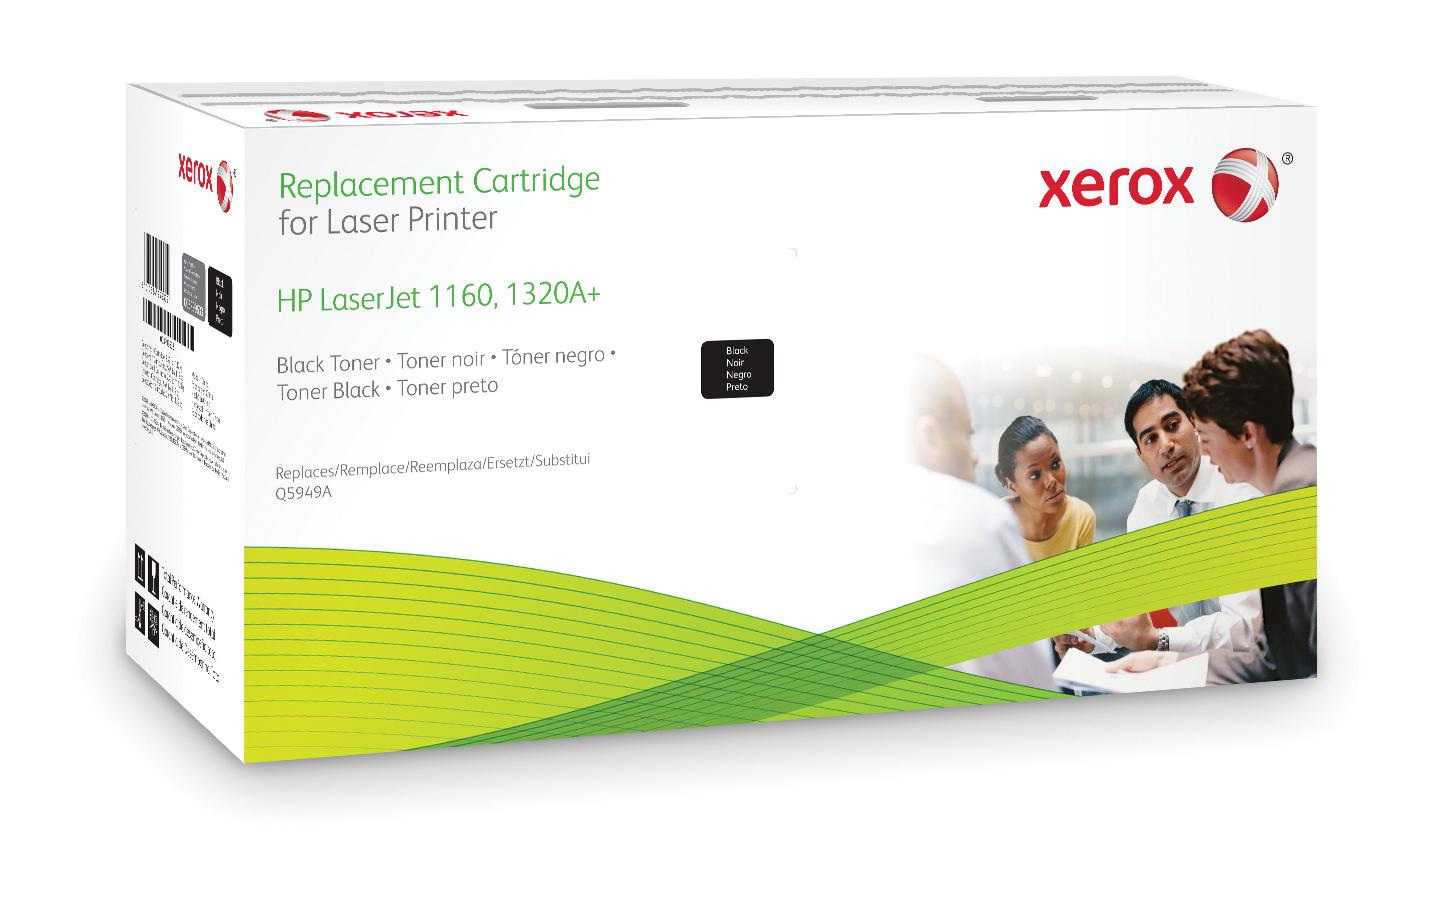 Xerox Cartucho De Tóner Negro. Equivalente A Hp Q5949A